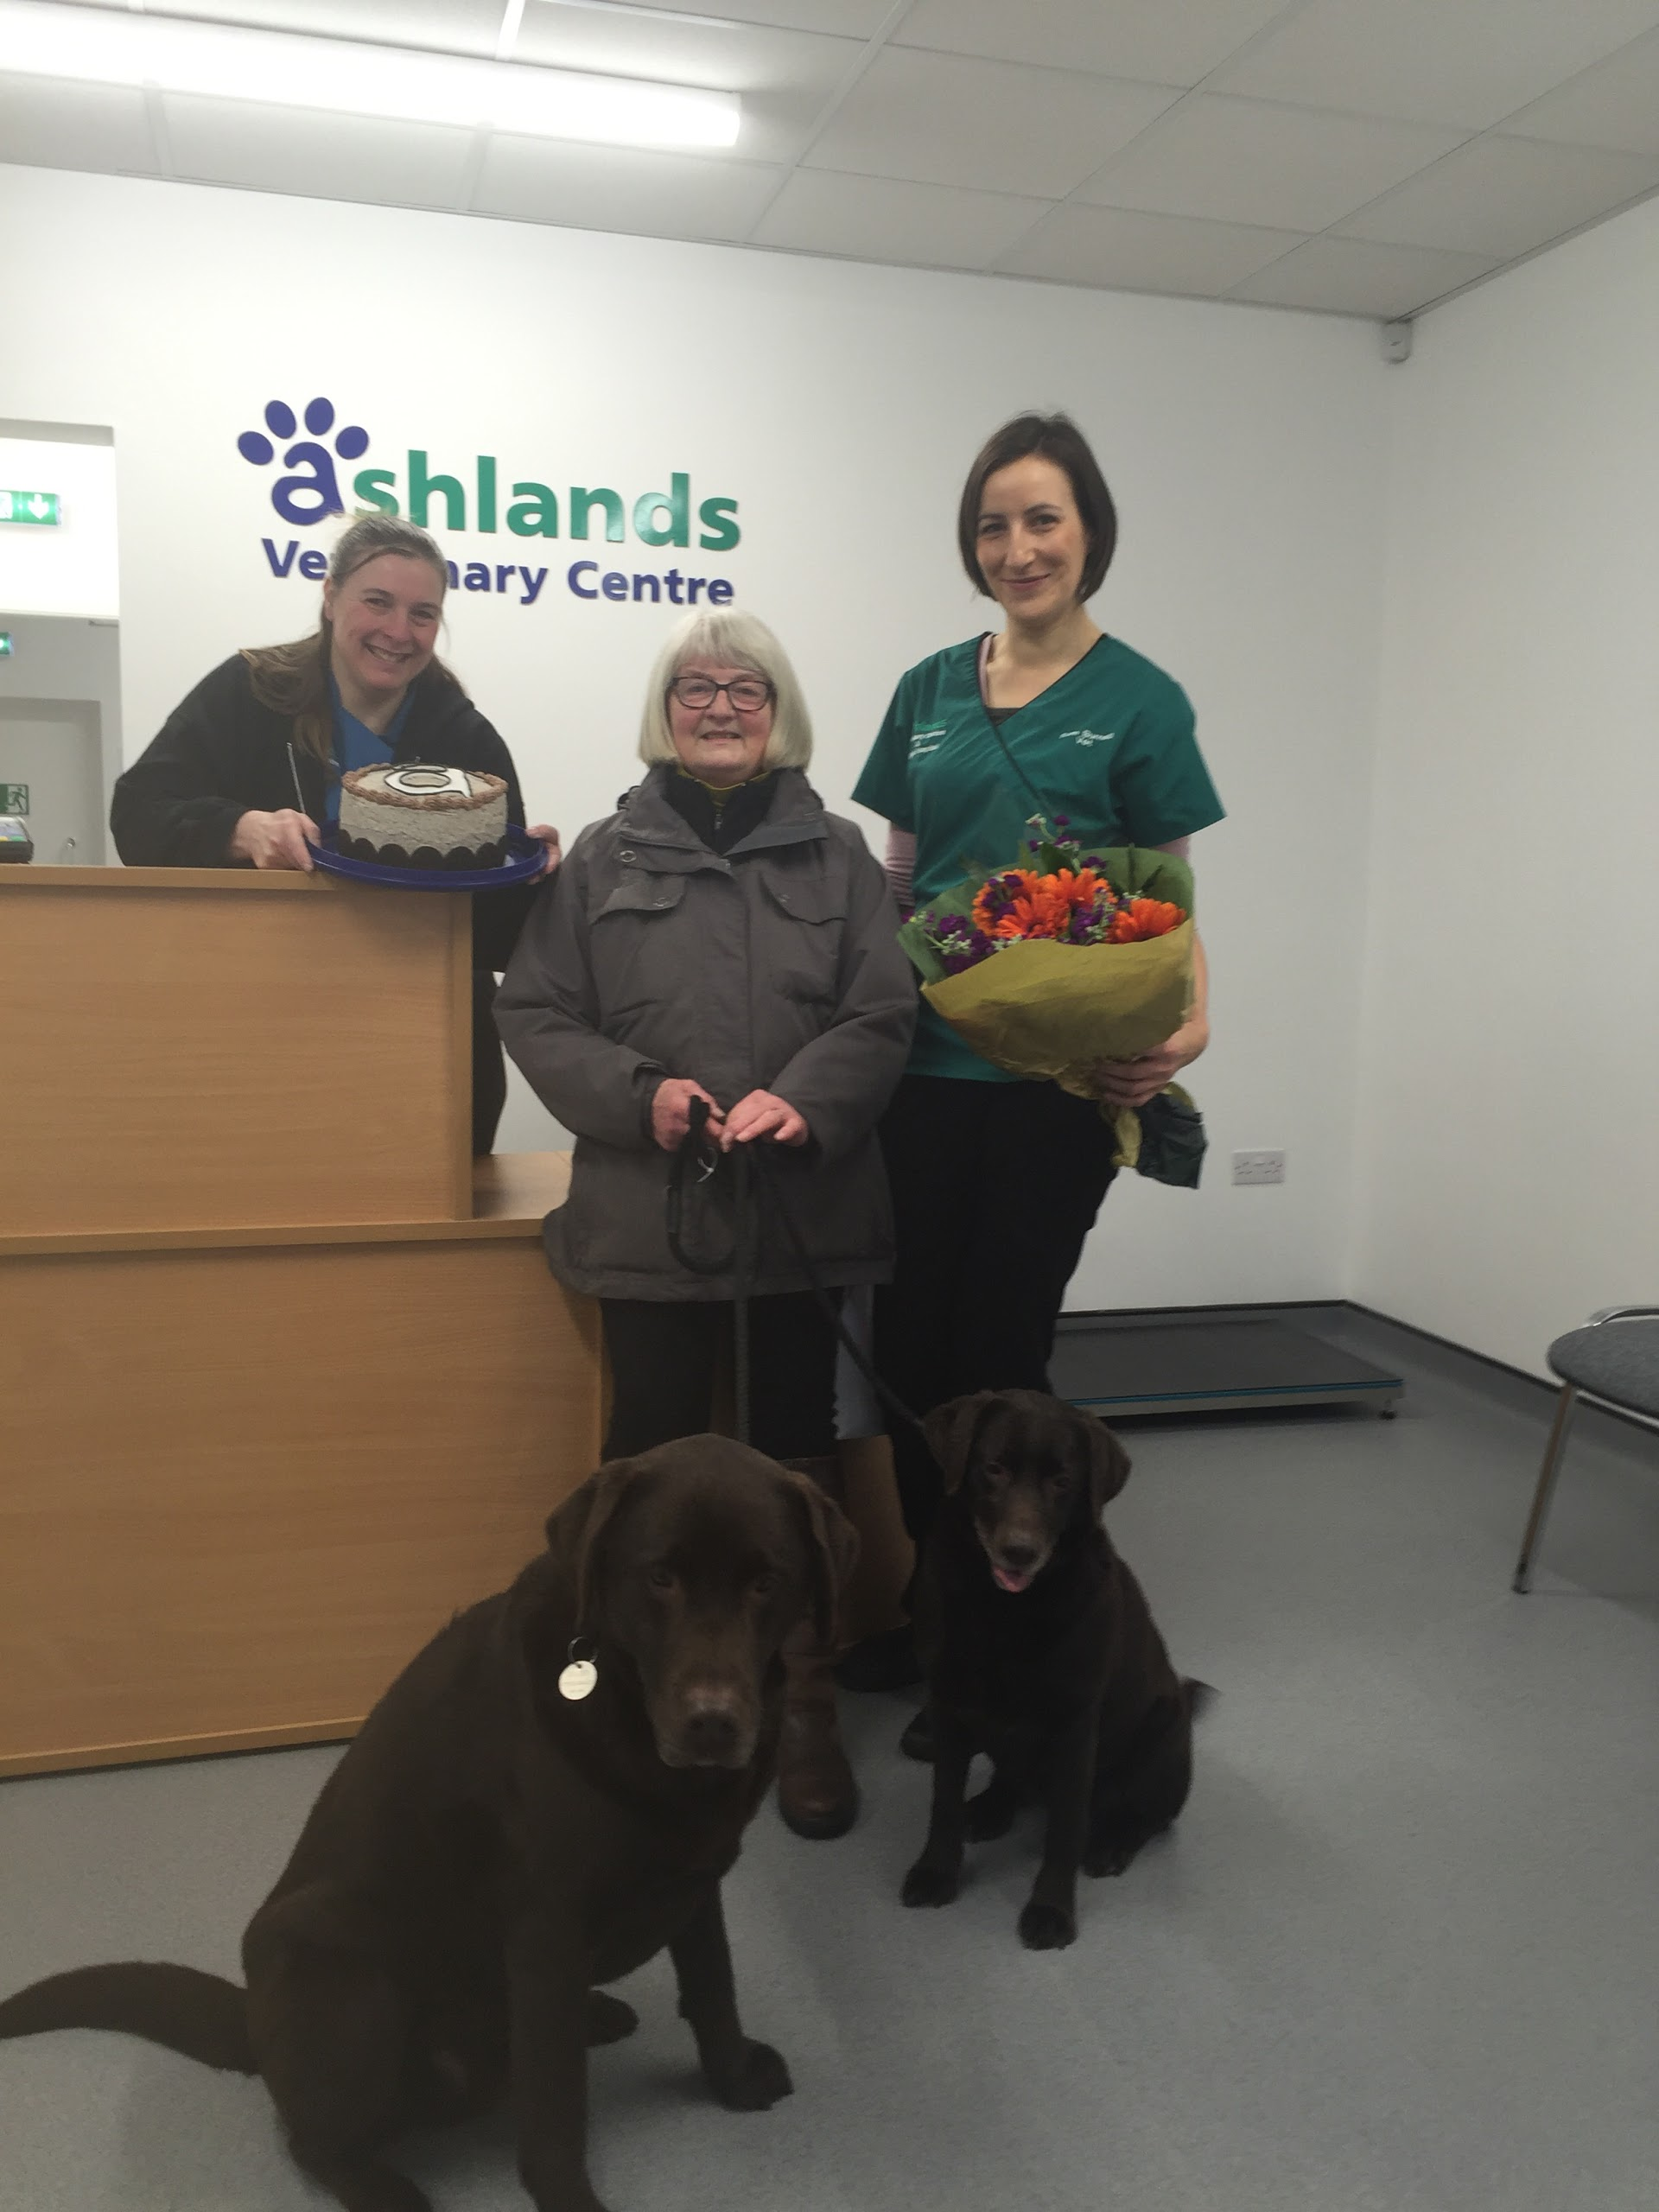 Ashlands Veterinary Centre, Skipton - Skipton, North Yorkshire BD23 2AB - 01756 636999   ShowMeLocal.com